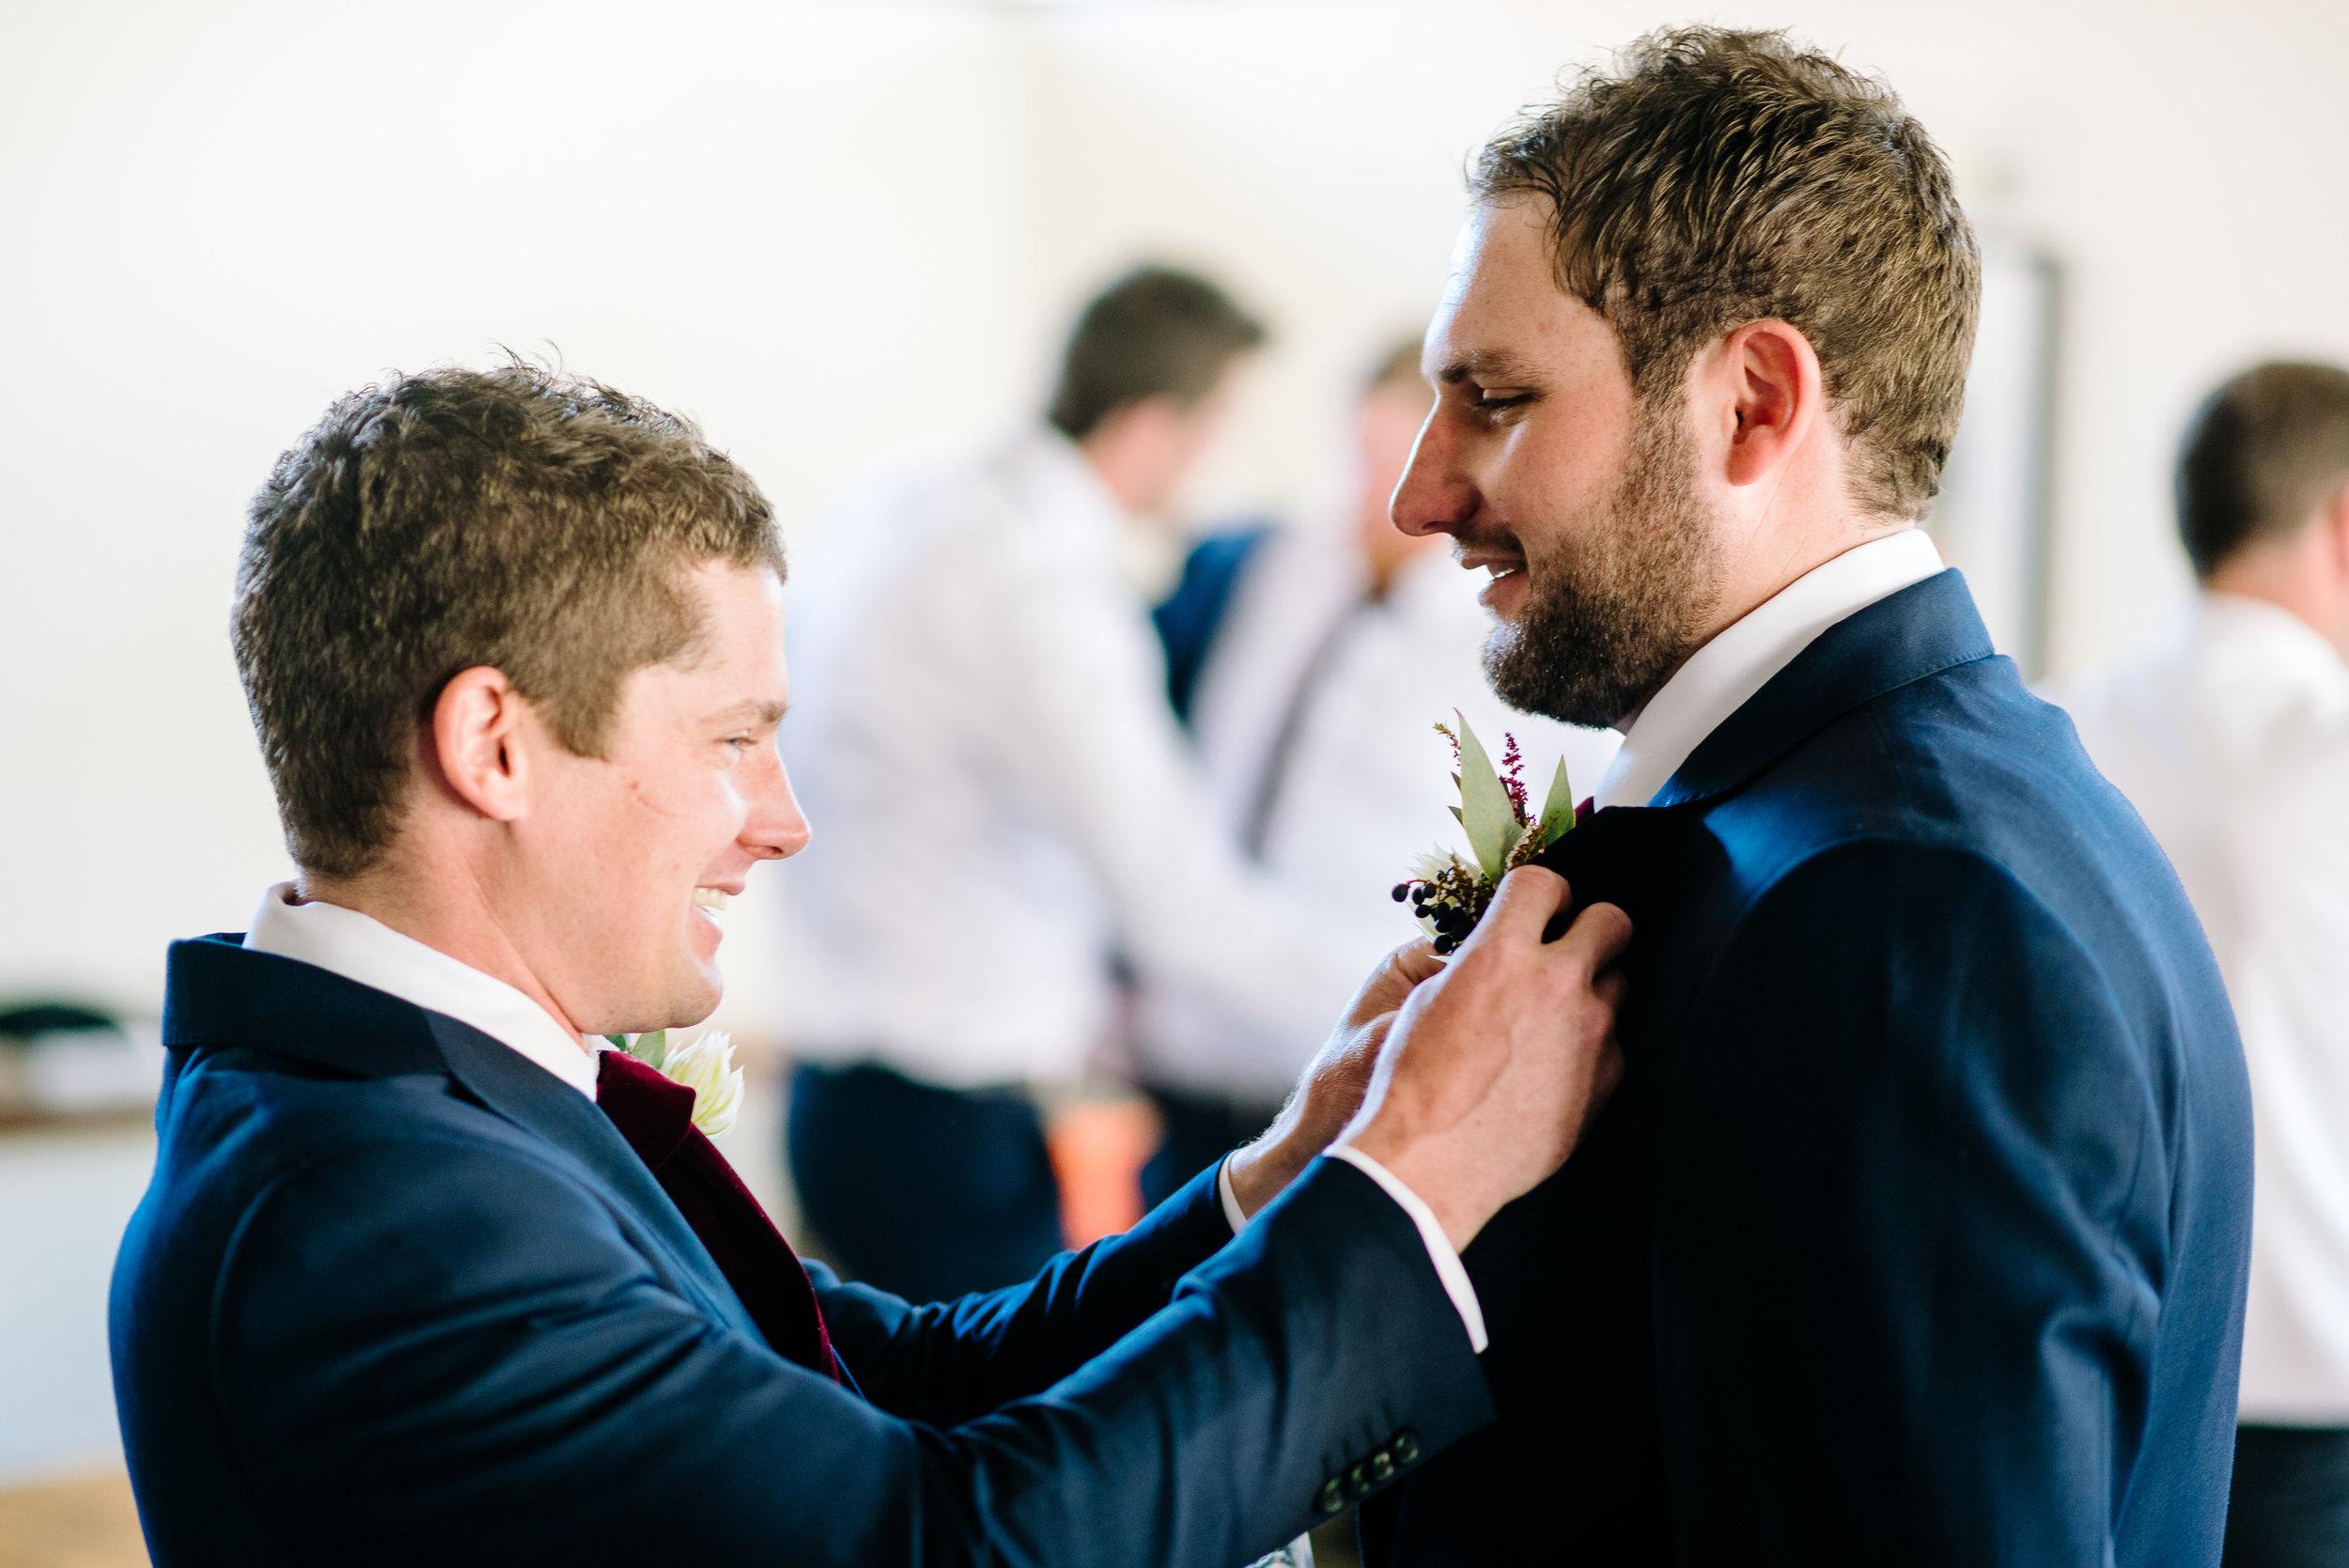 Justin_And_Jim_Photography_Byron_Bay_Wedding018.JPG